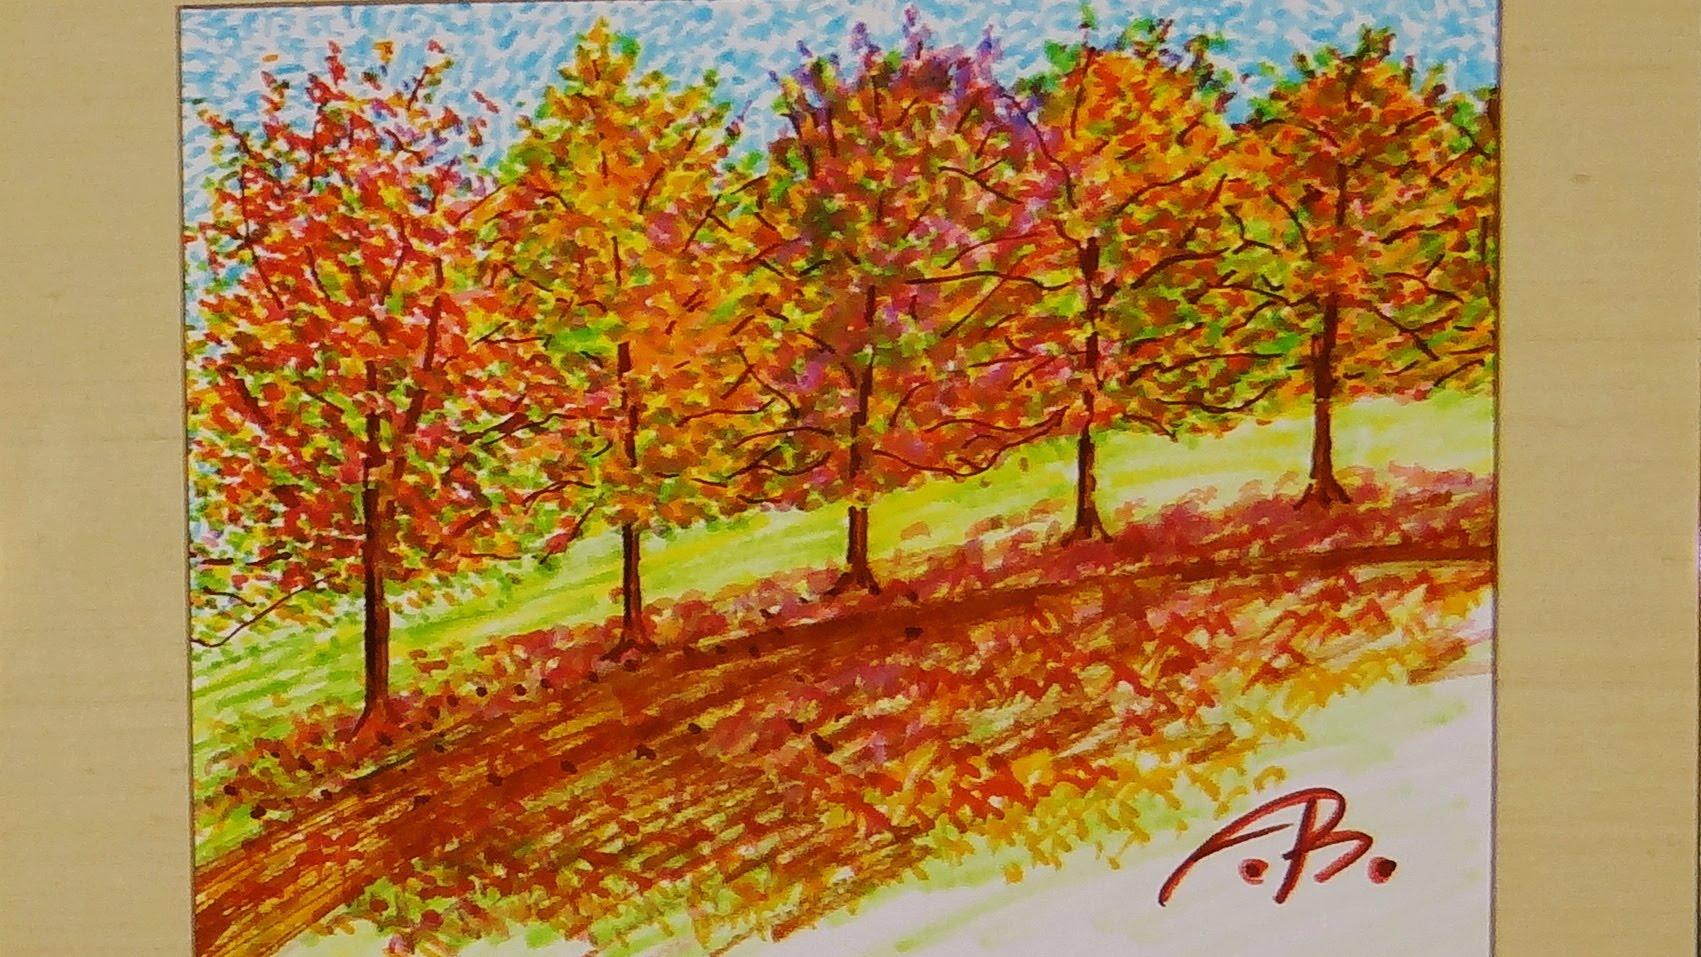 1701x957 Marker Art Fall Foliage Line Of Trees